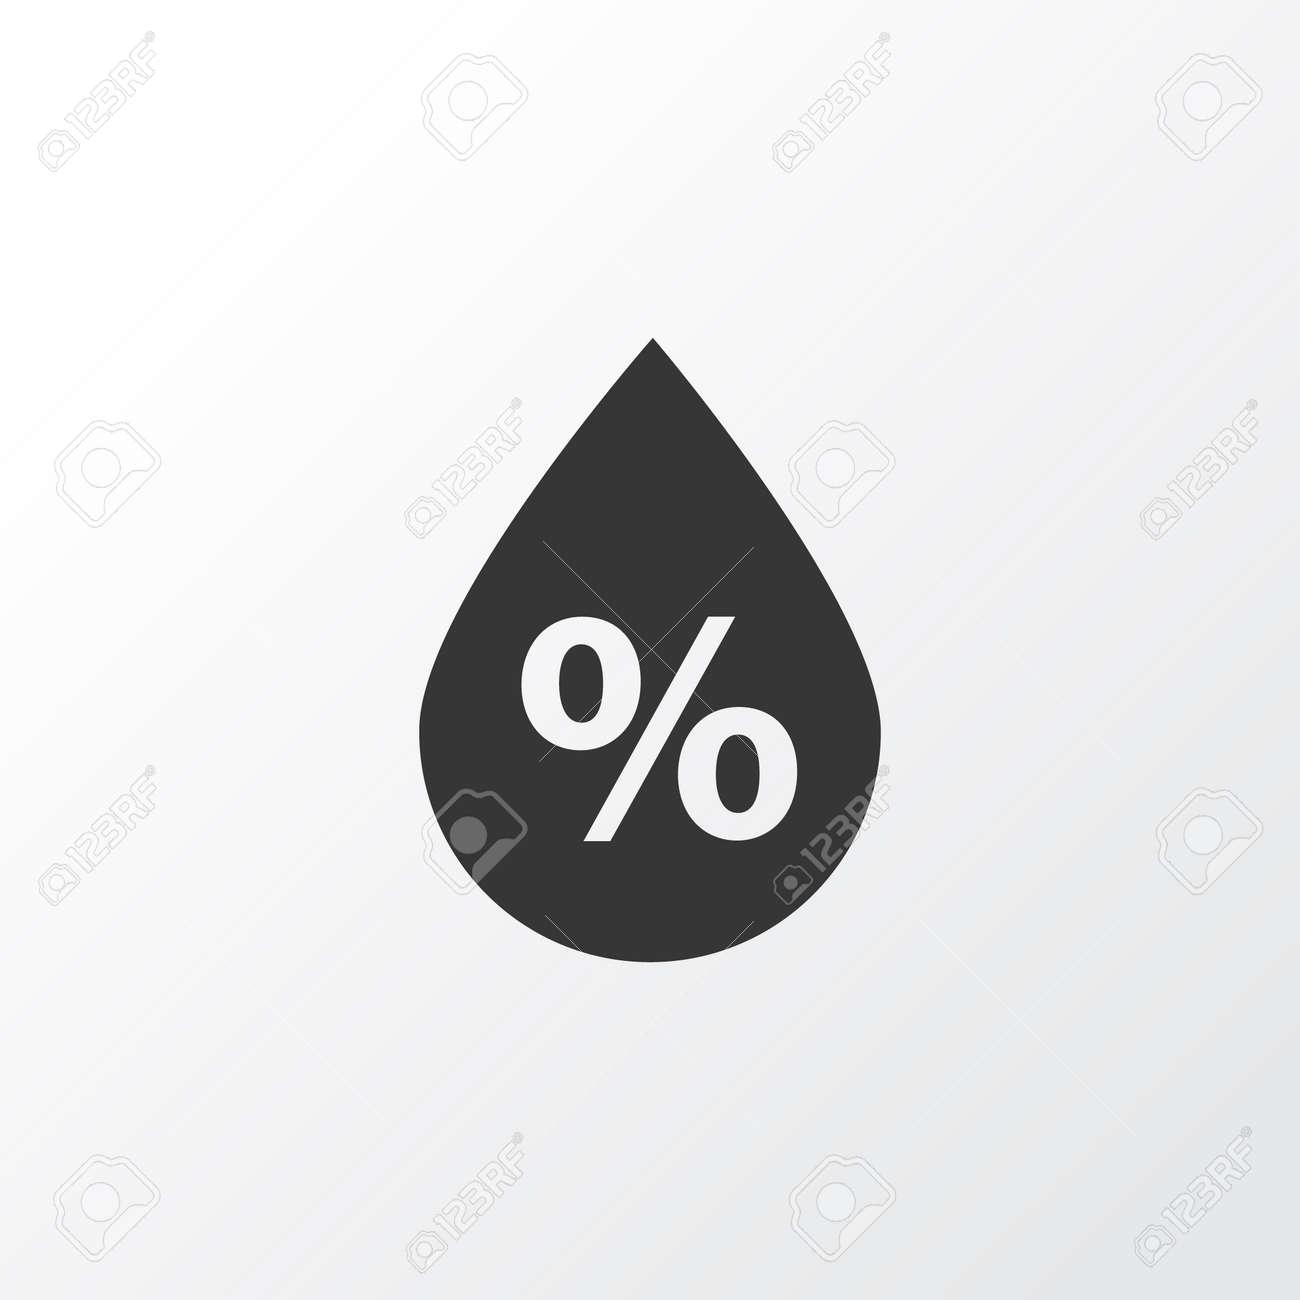 Humidity Icon Symbol. Premium Quality Isolated Moisture Element In Trendy Style. - 84739114